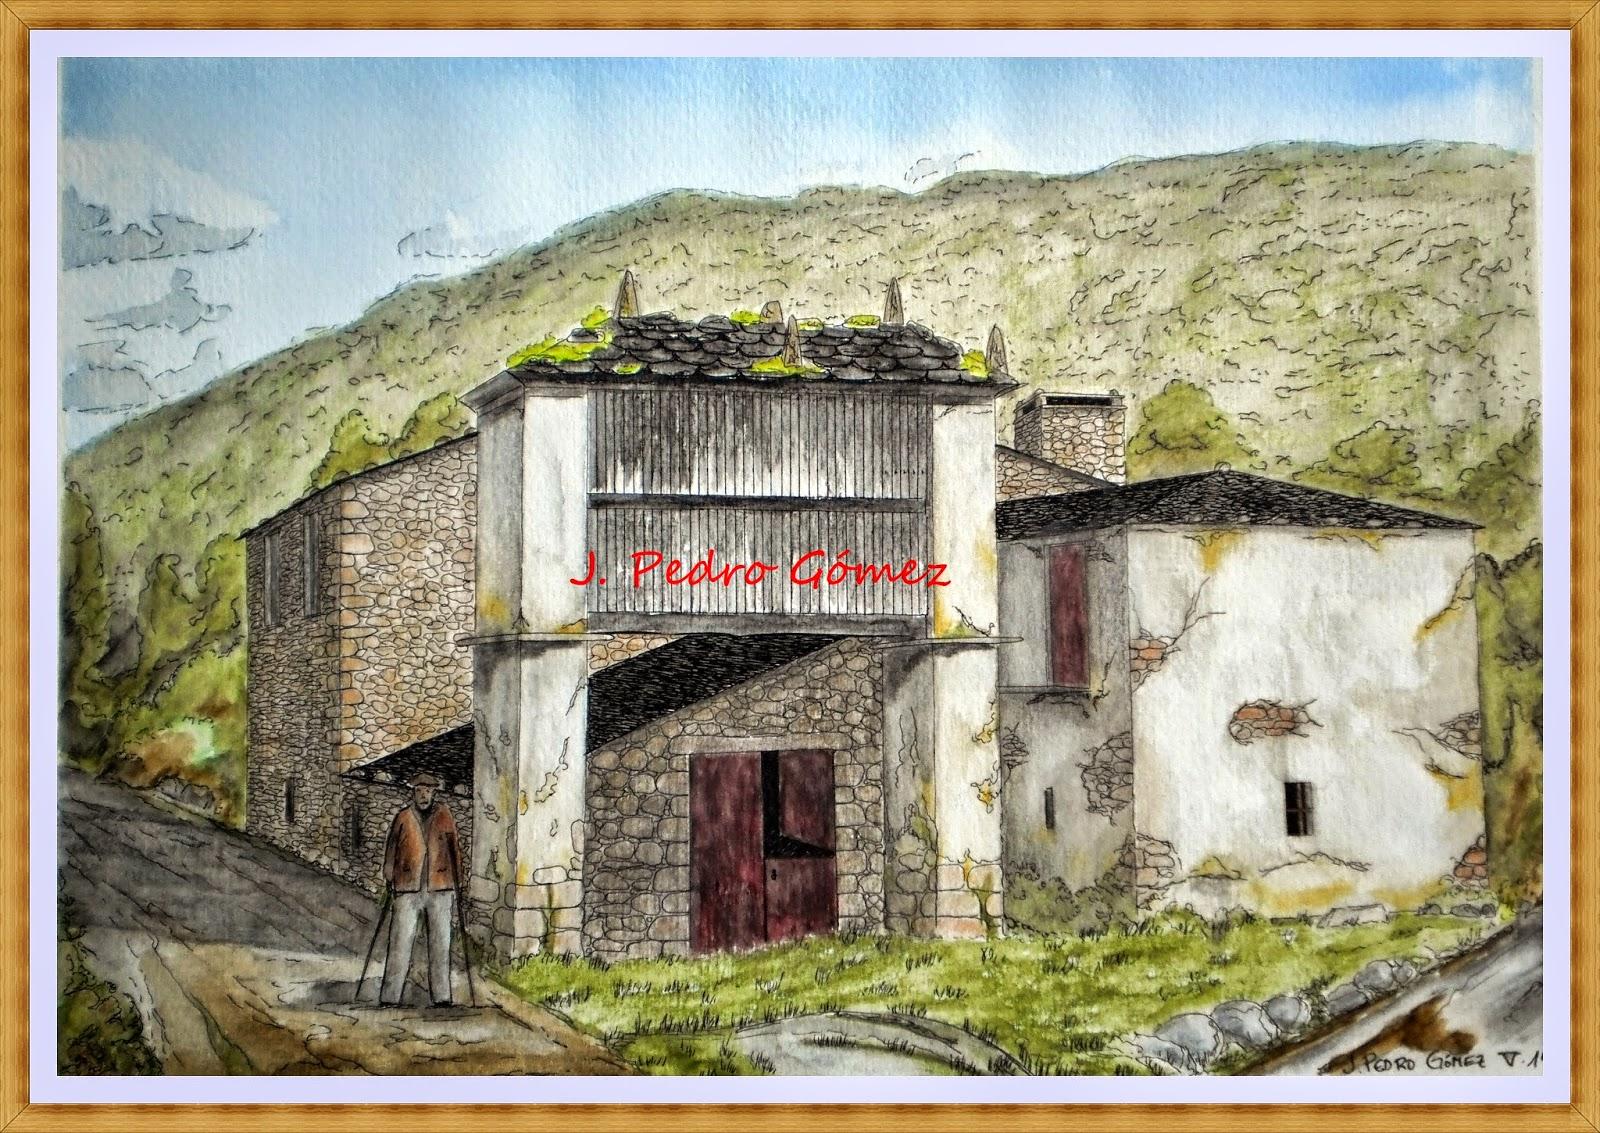 casa rural, viloalle, mondoñedo, lugo, plumilla, acuarela, tecnica mixta, dibujo, pintura, color,